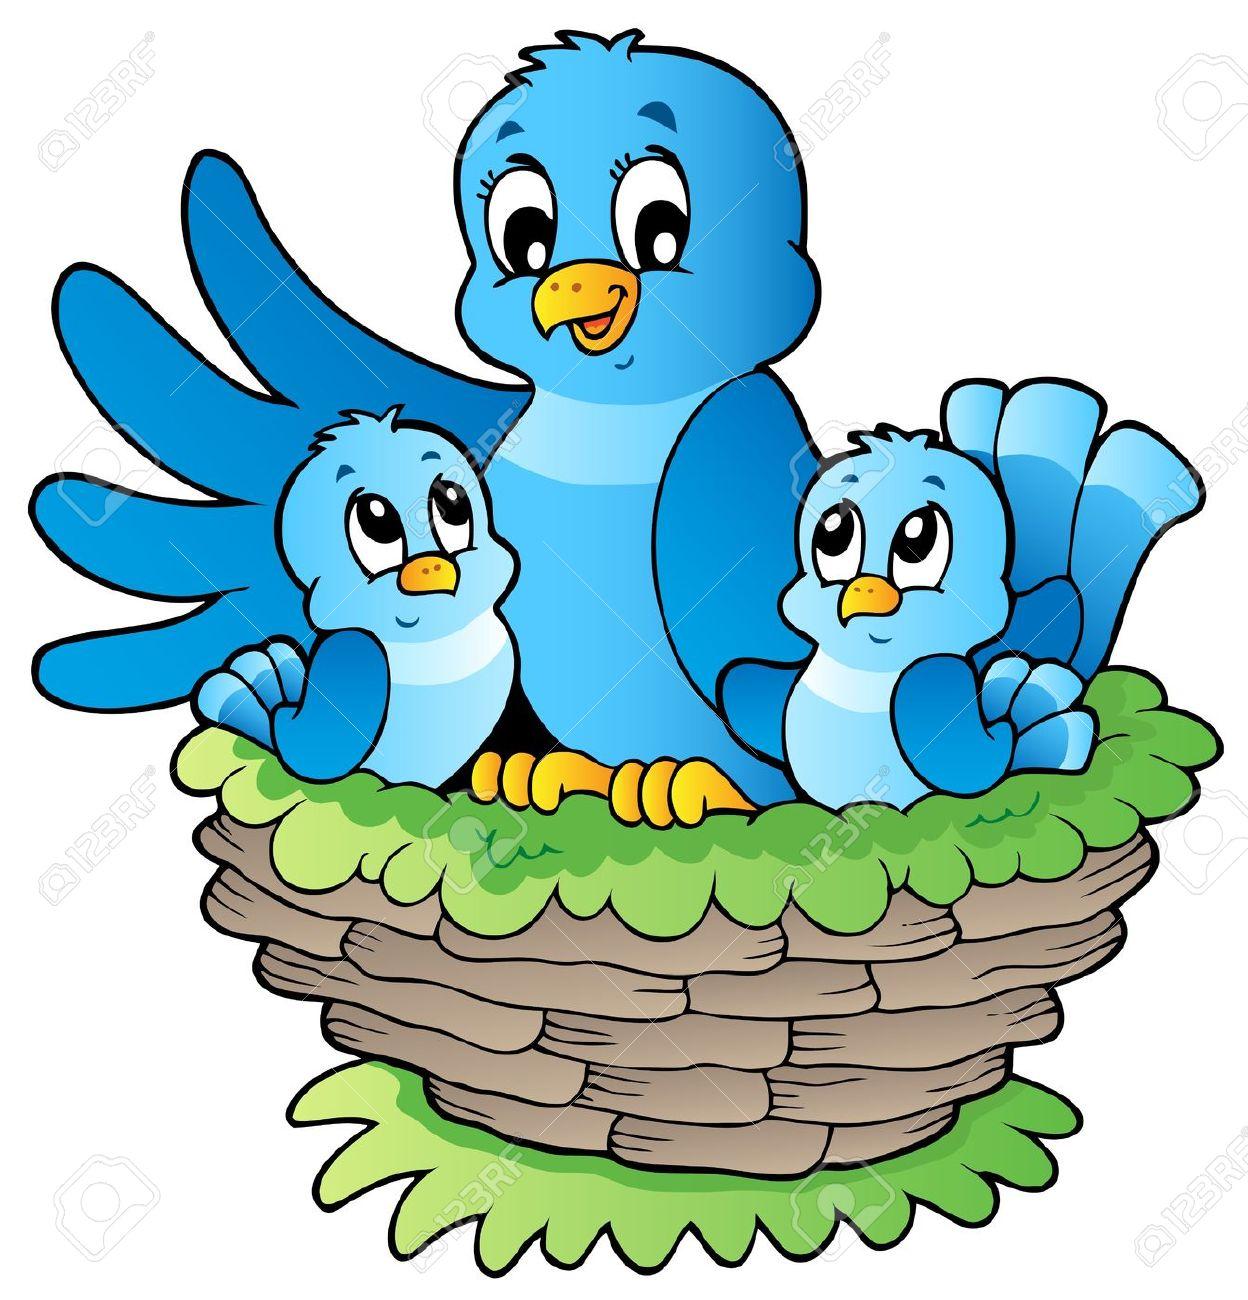 1248x1300 Bird's Nest Clipart Animated